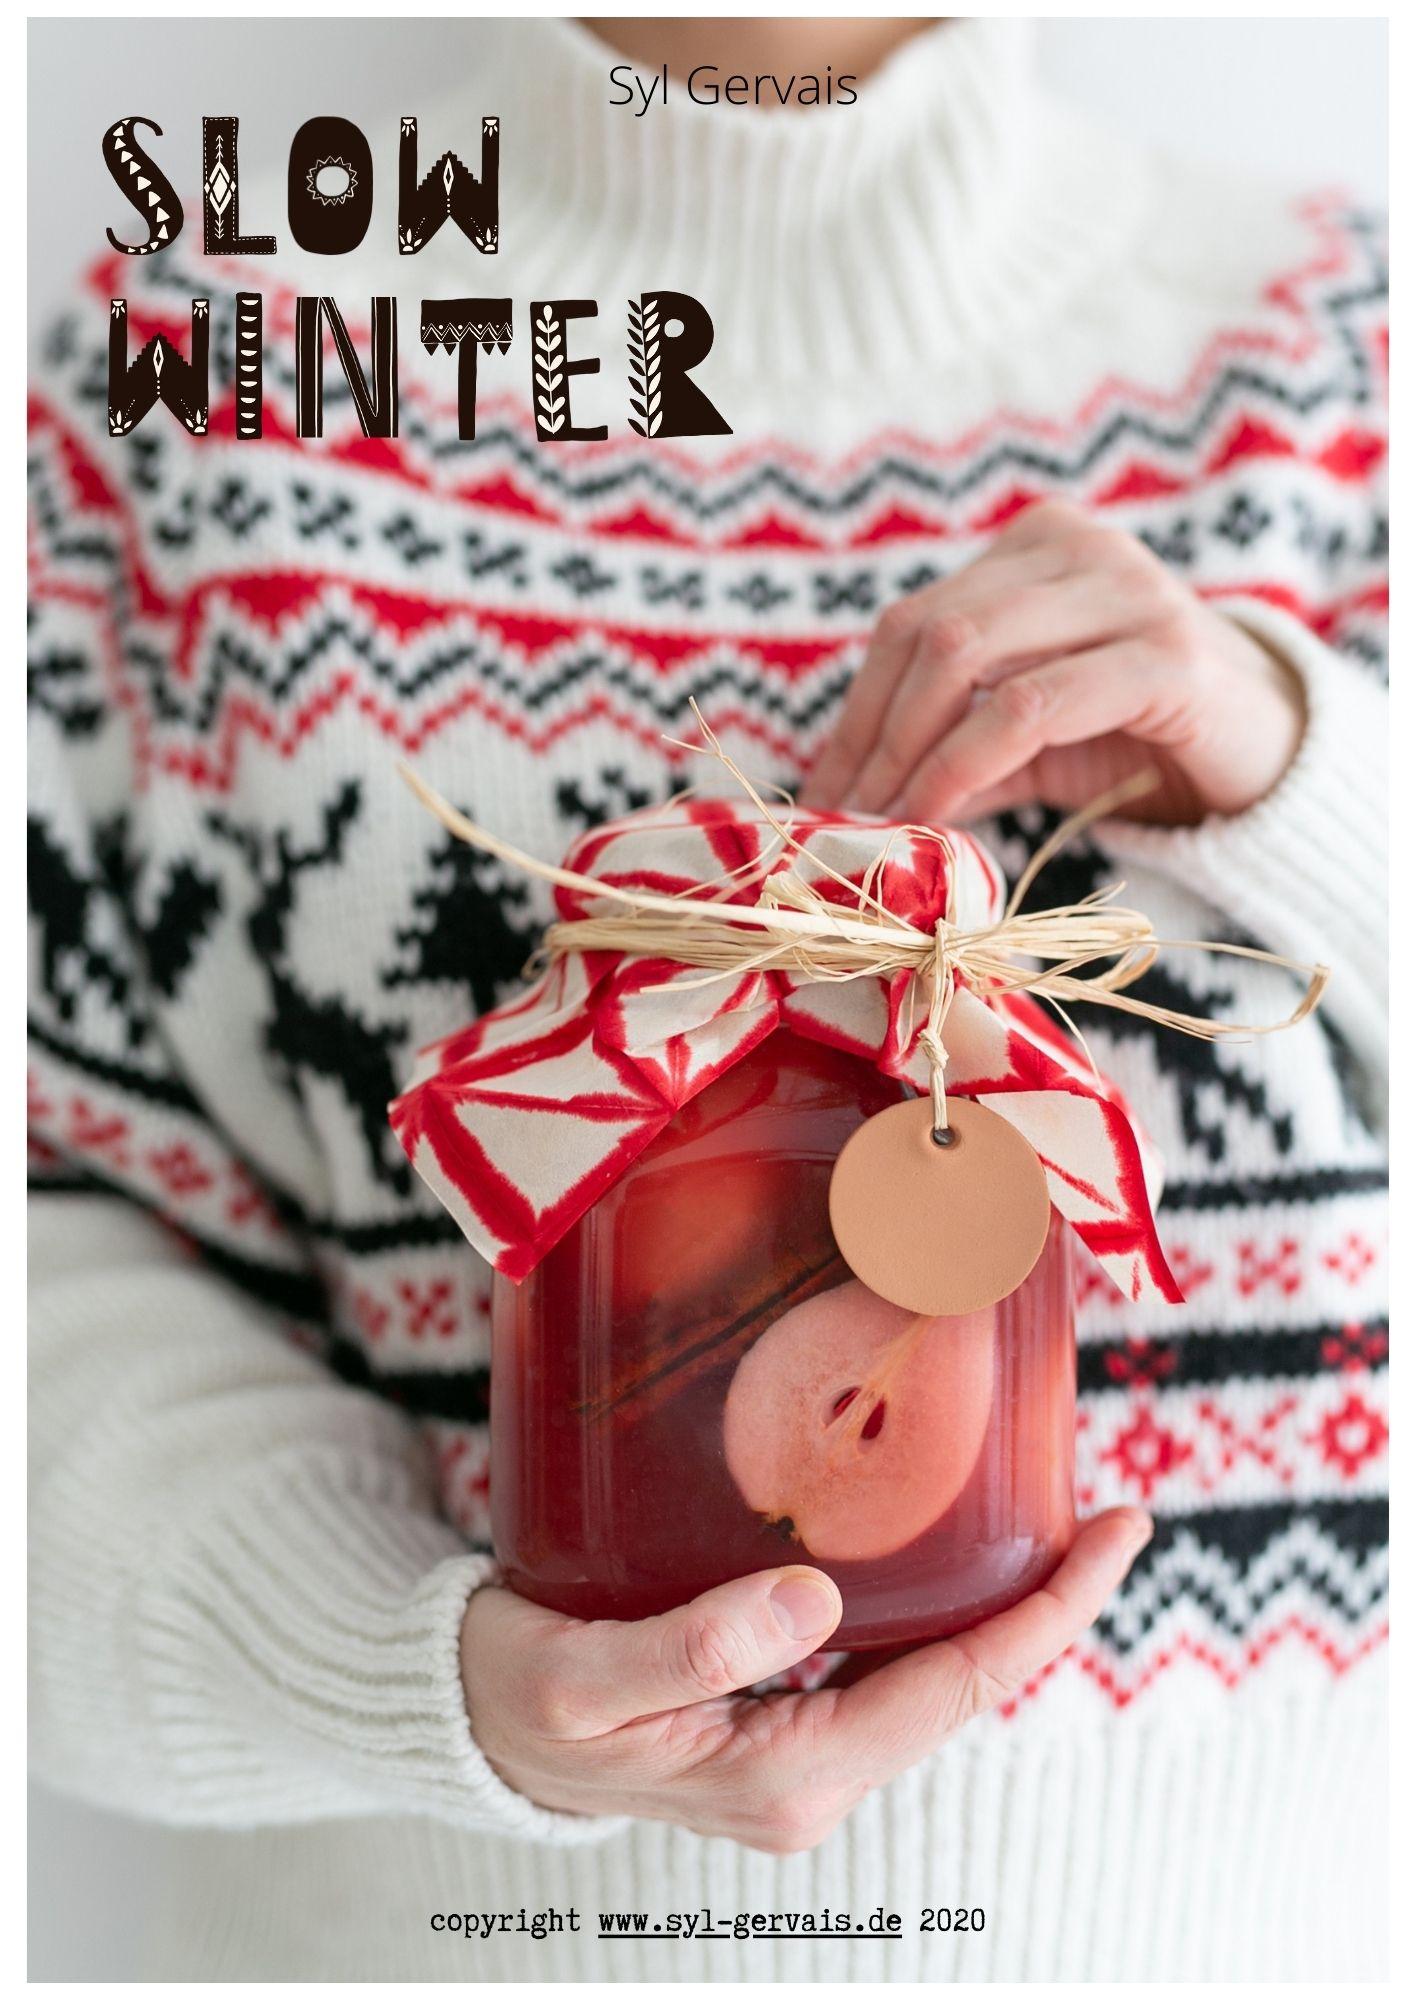 Winter Shrubs | Gesunde vegane Rezepte, Fermentation, Nachhaltigkeit - Syl Gervais